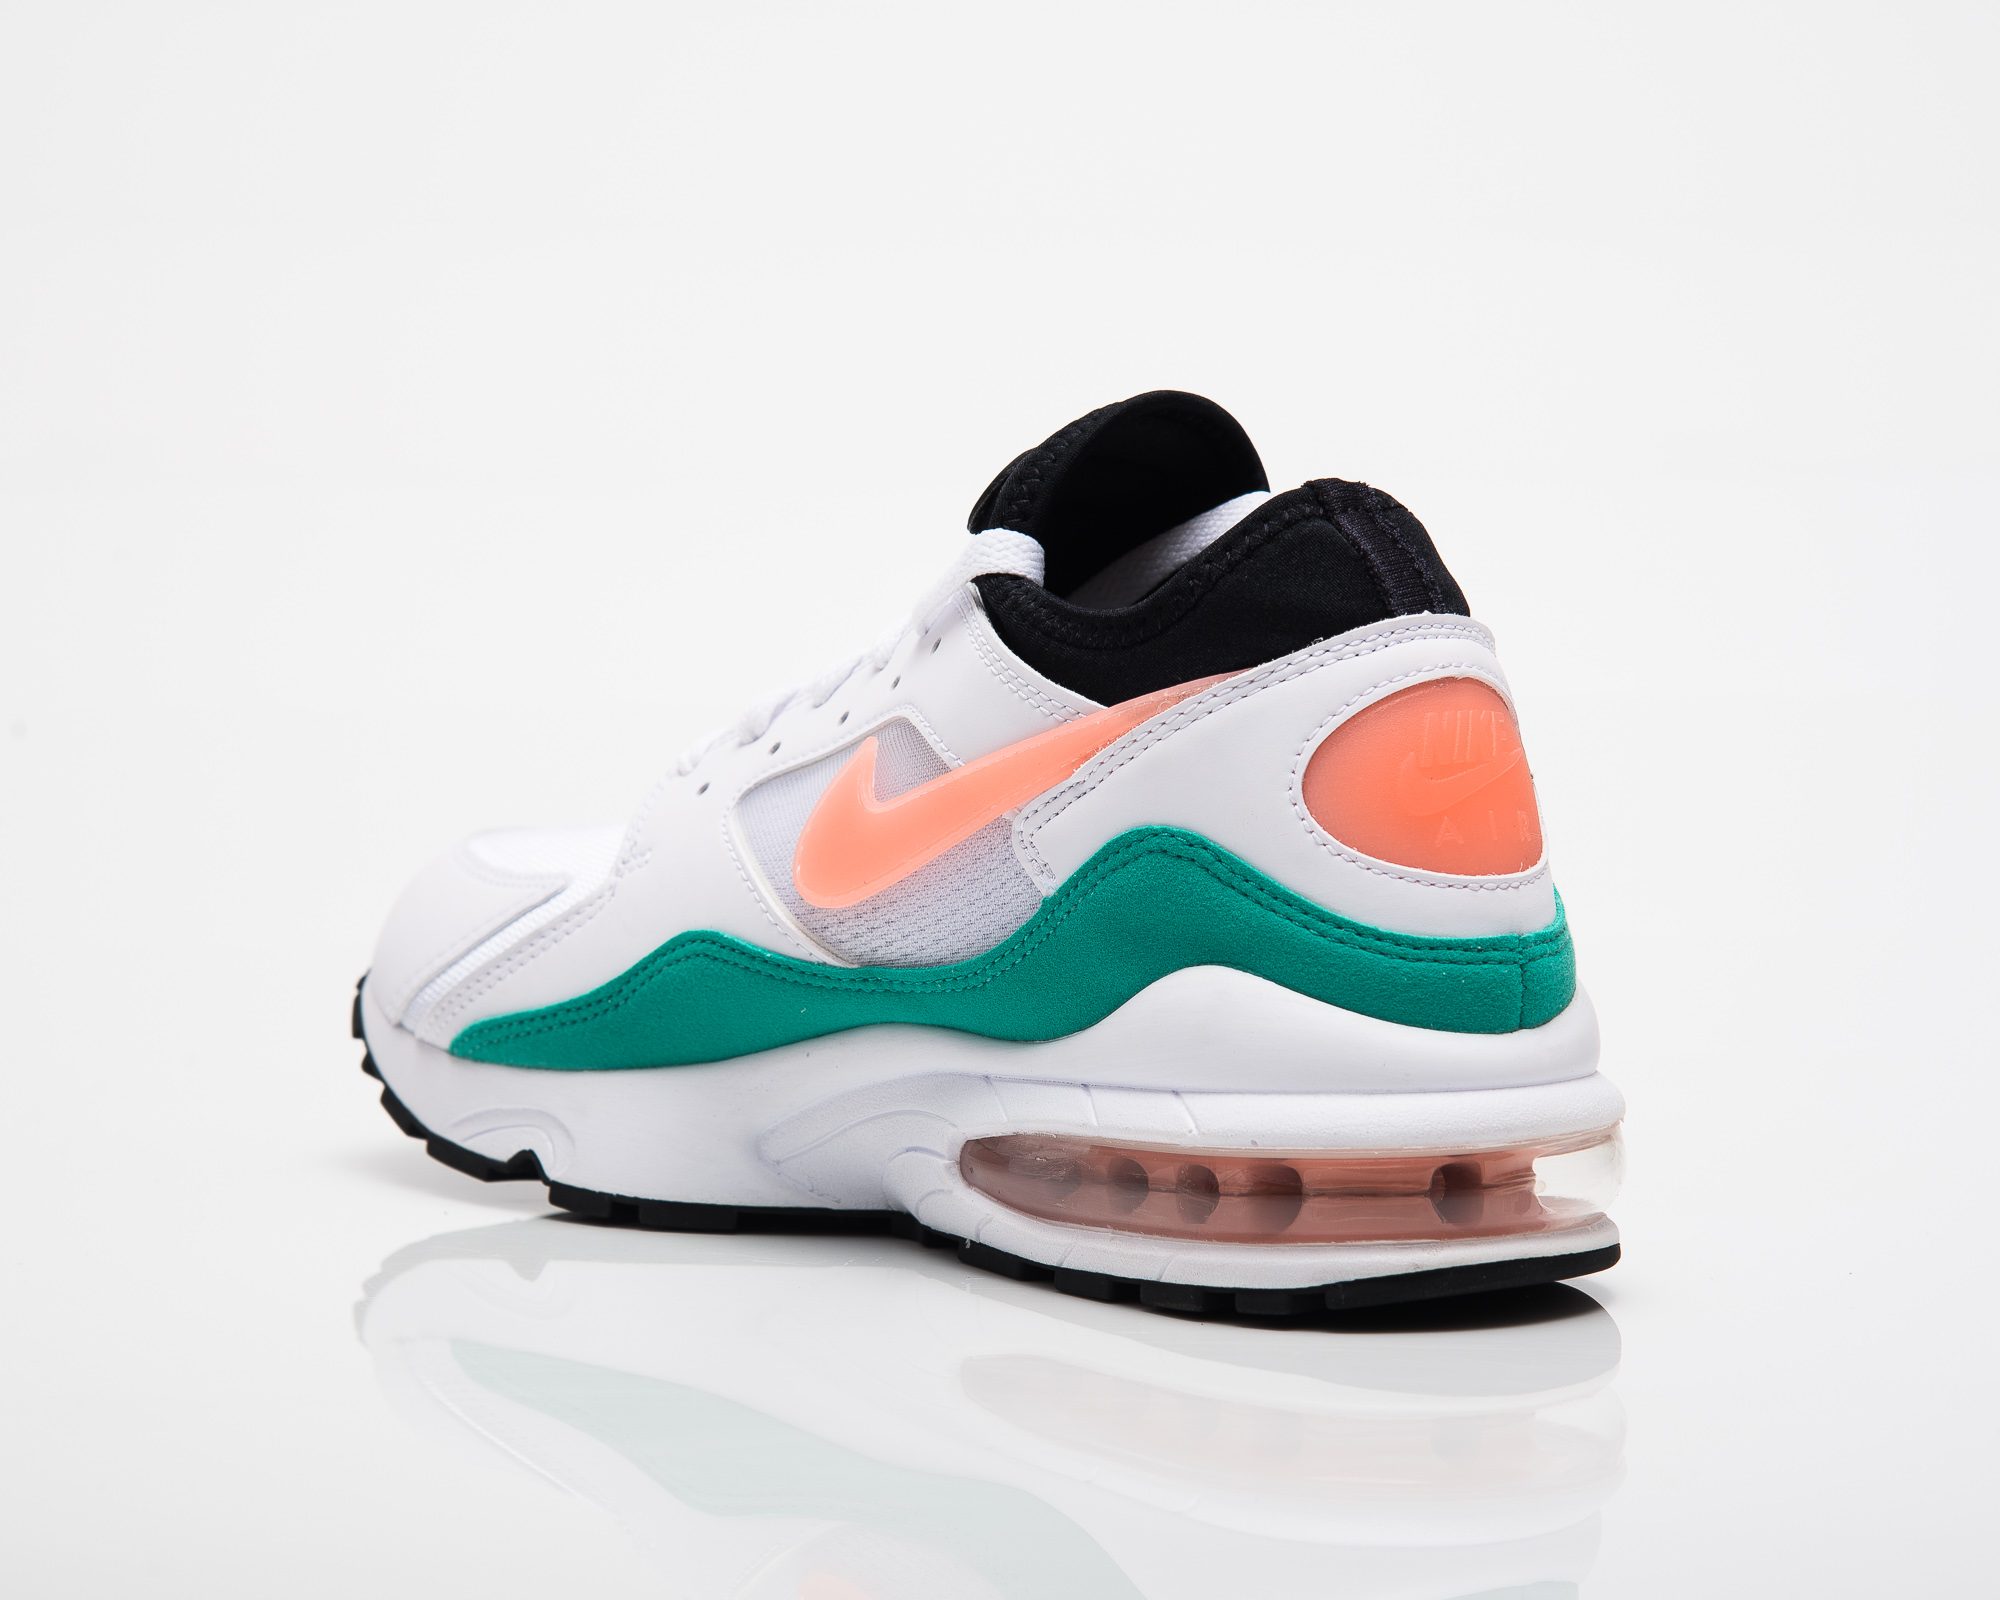 877dcebaab Nike Air Max 93 Watermelon - Shoes Casual - Sporting goods | sil.lt